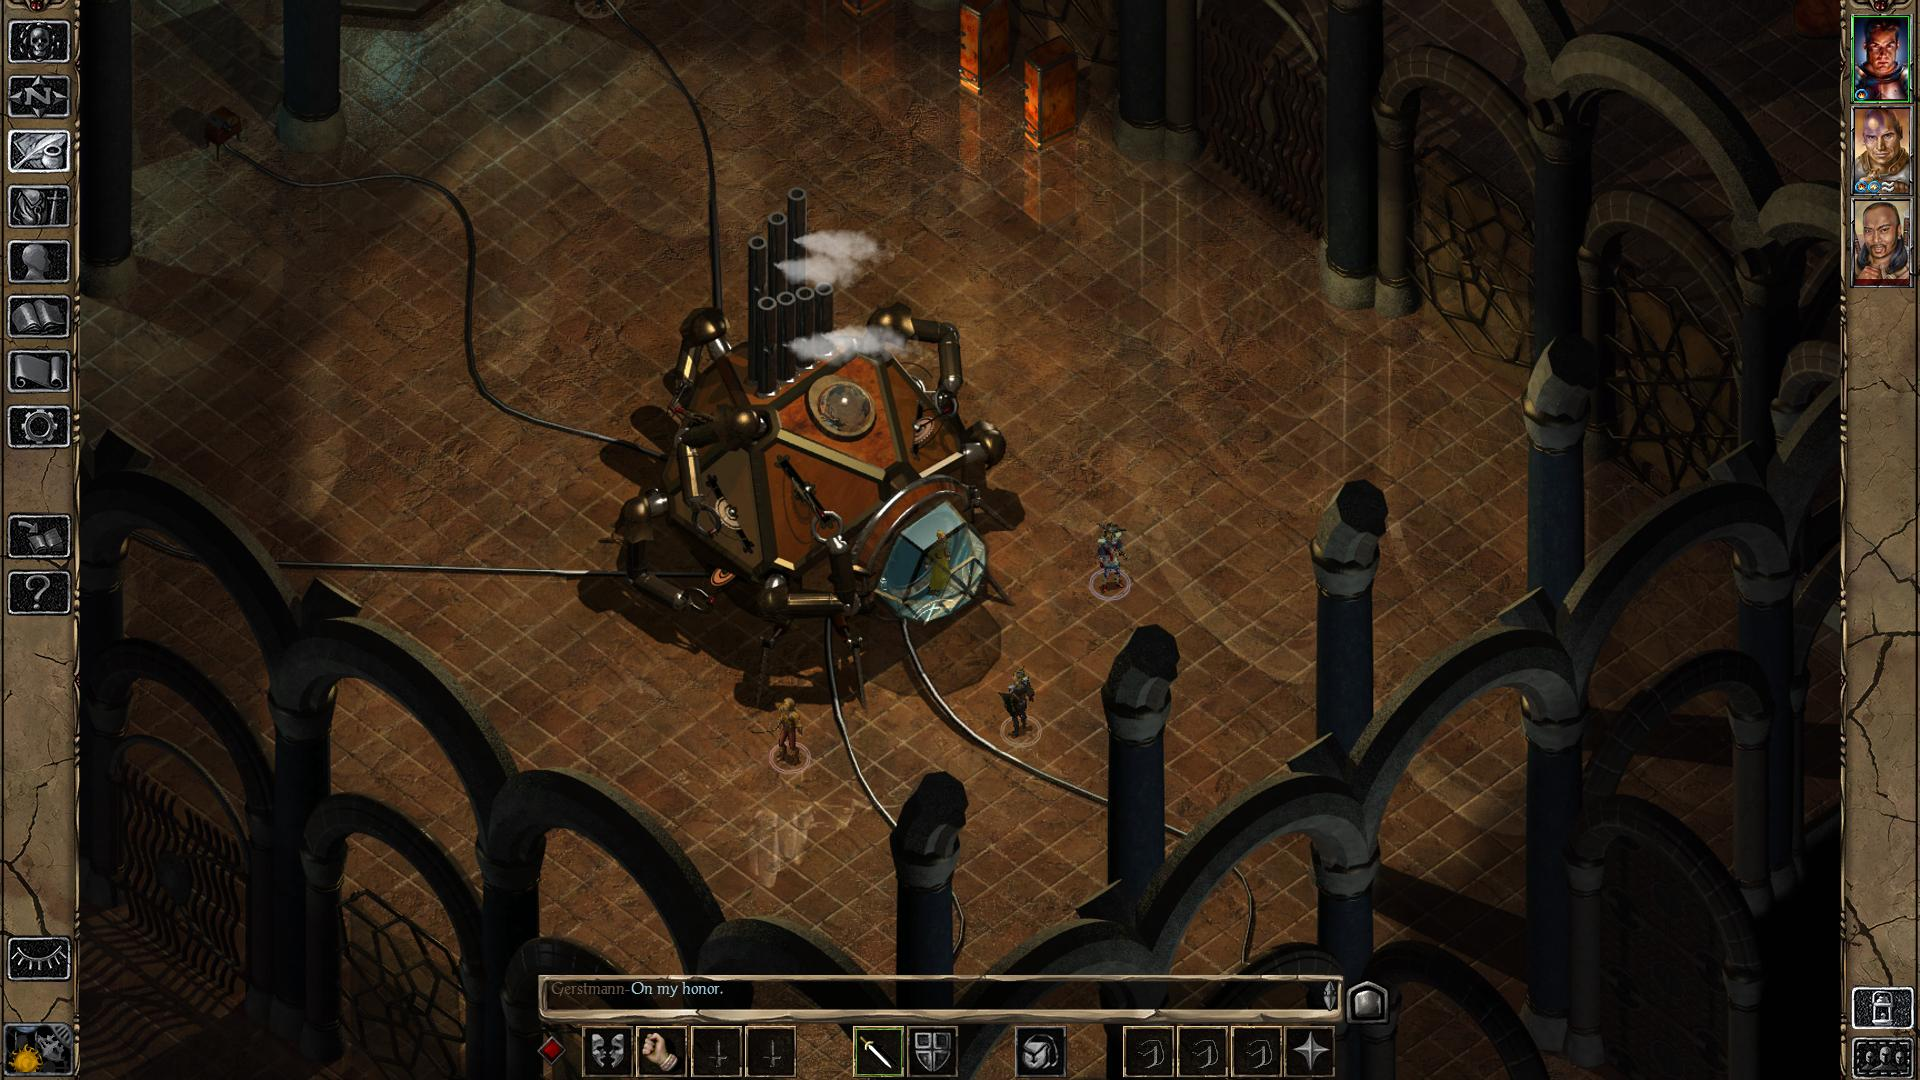 Baldur's Gate II: Enhanced Edition for PC.